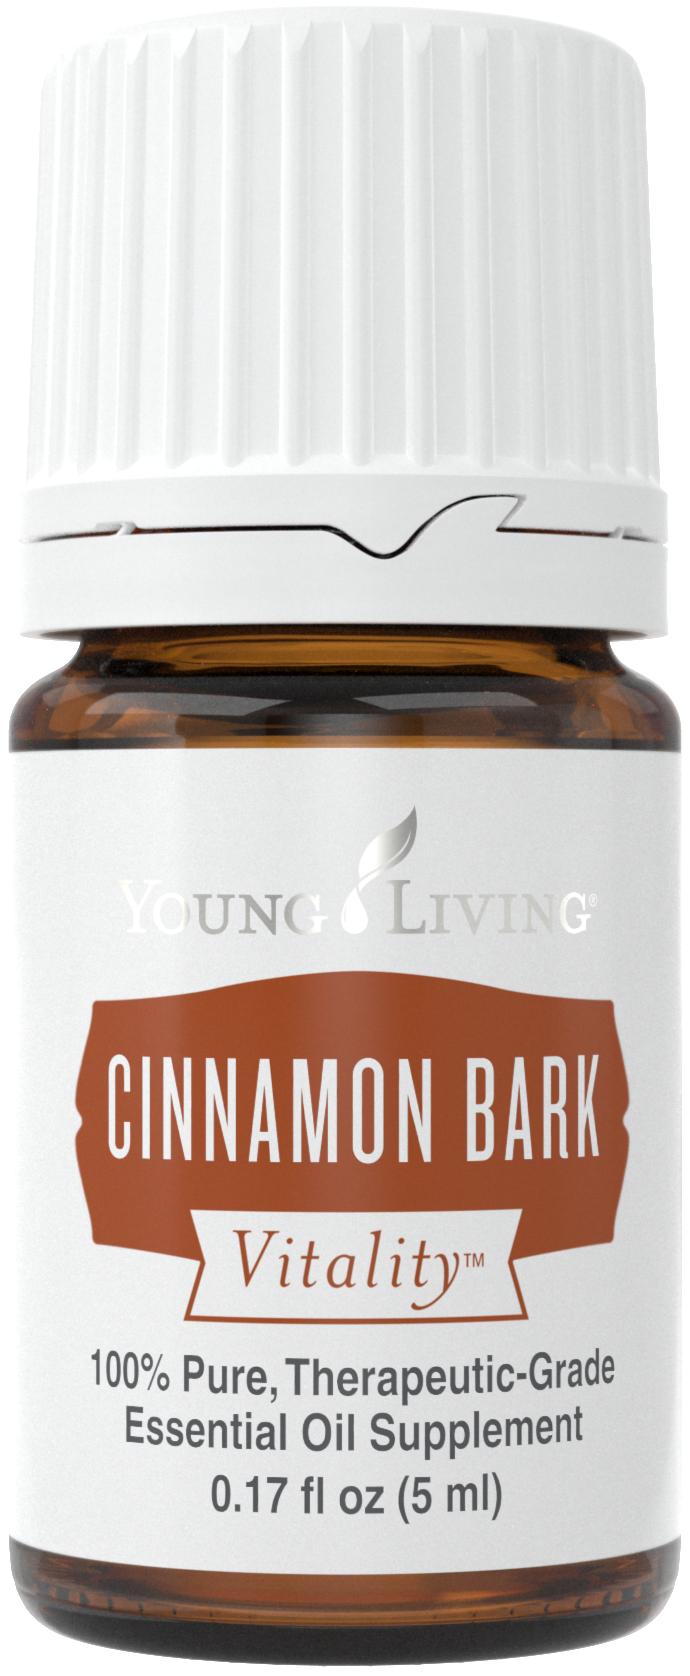 cinnamonbark_5ml_suplement_silo_2016_24402451325_o